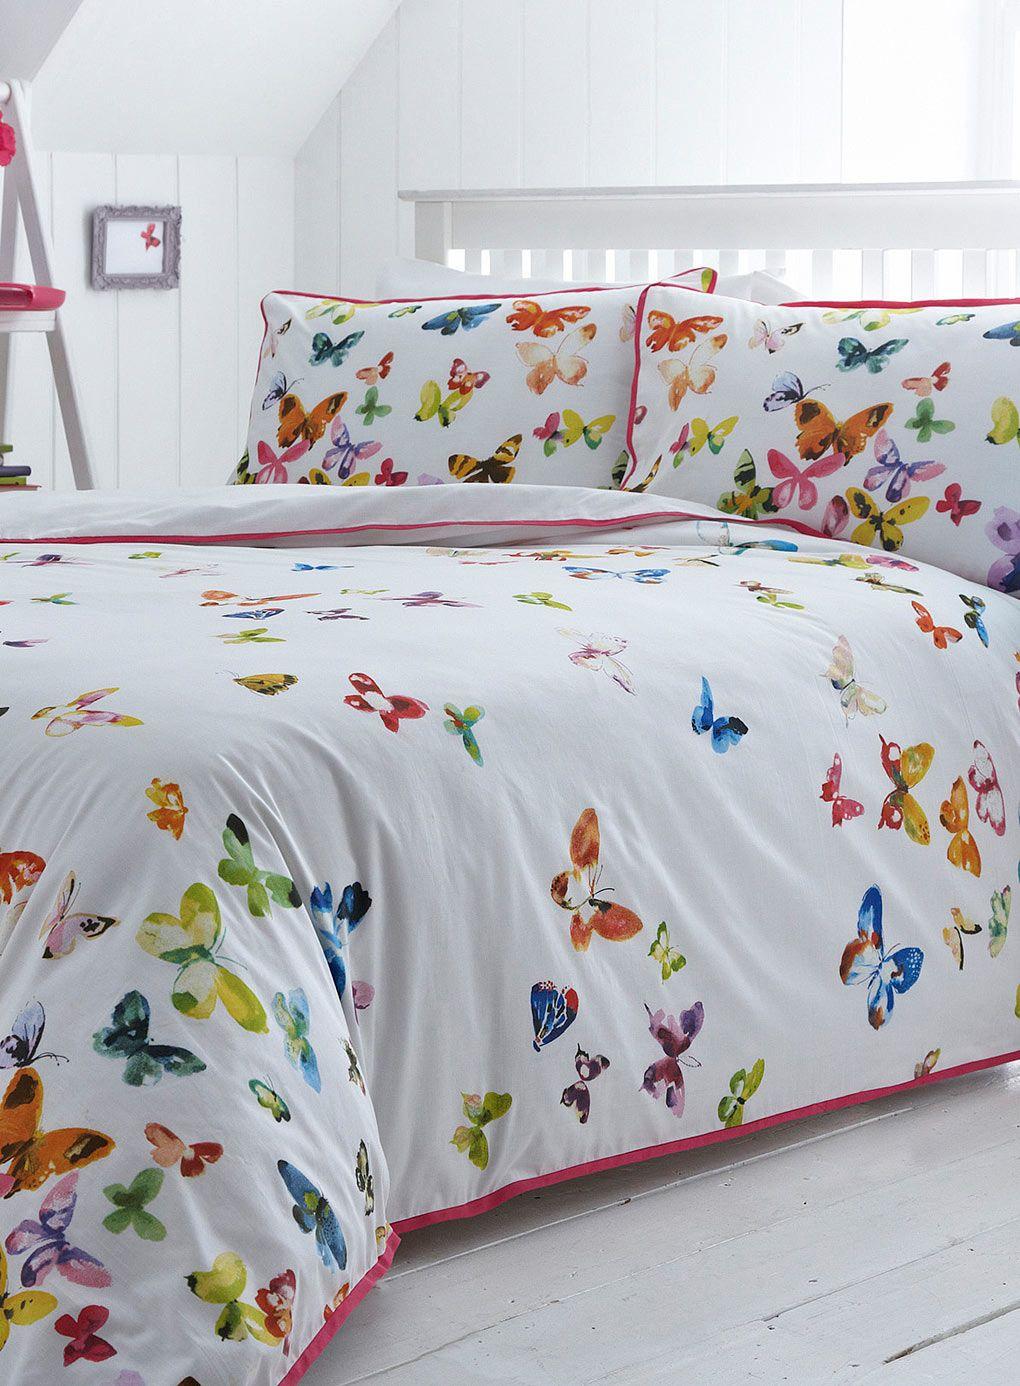 Organic Mattress Butterfly Bedroom Butterfly Bedding Butterfly Duvet Cover